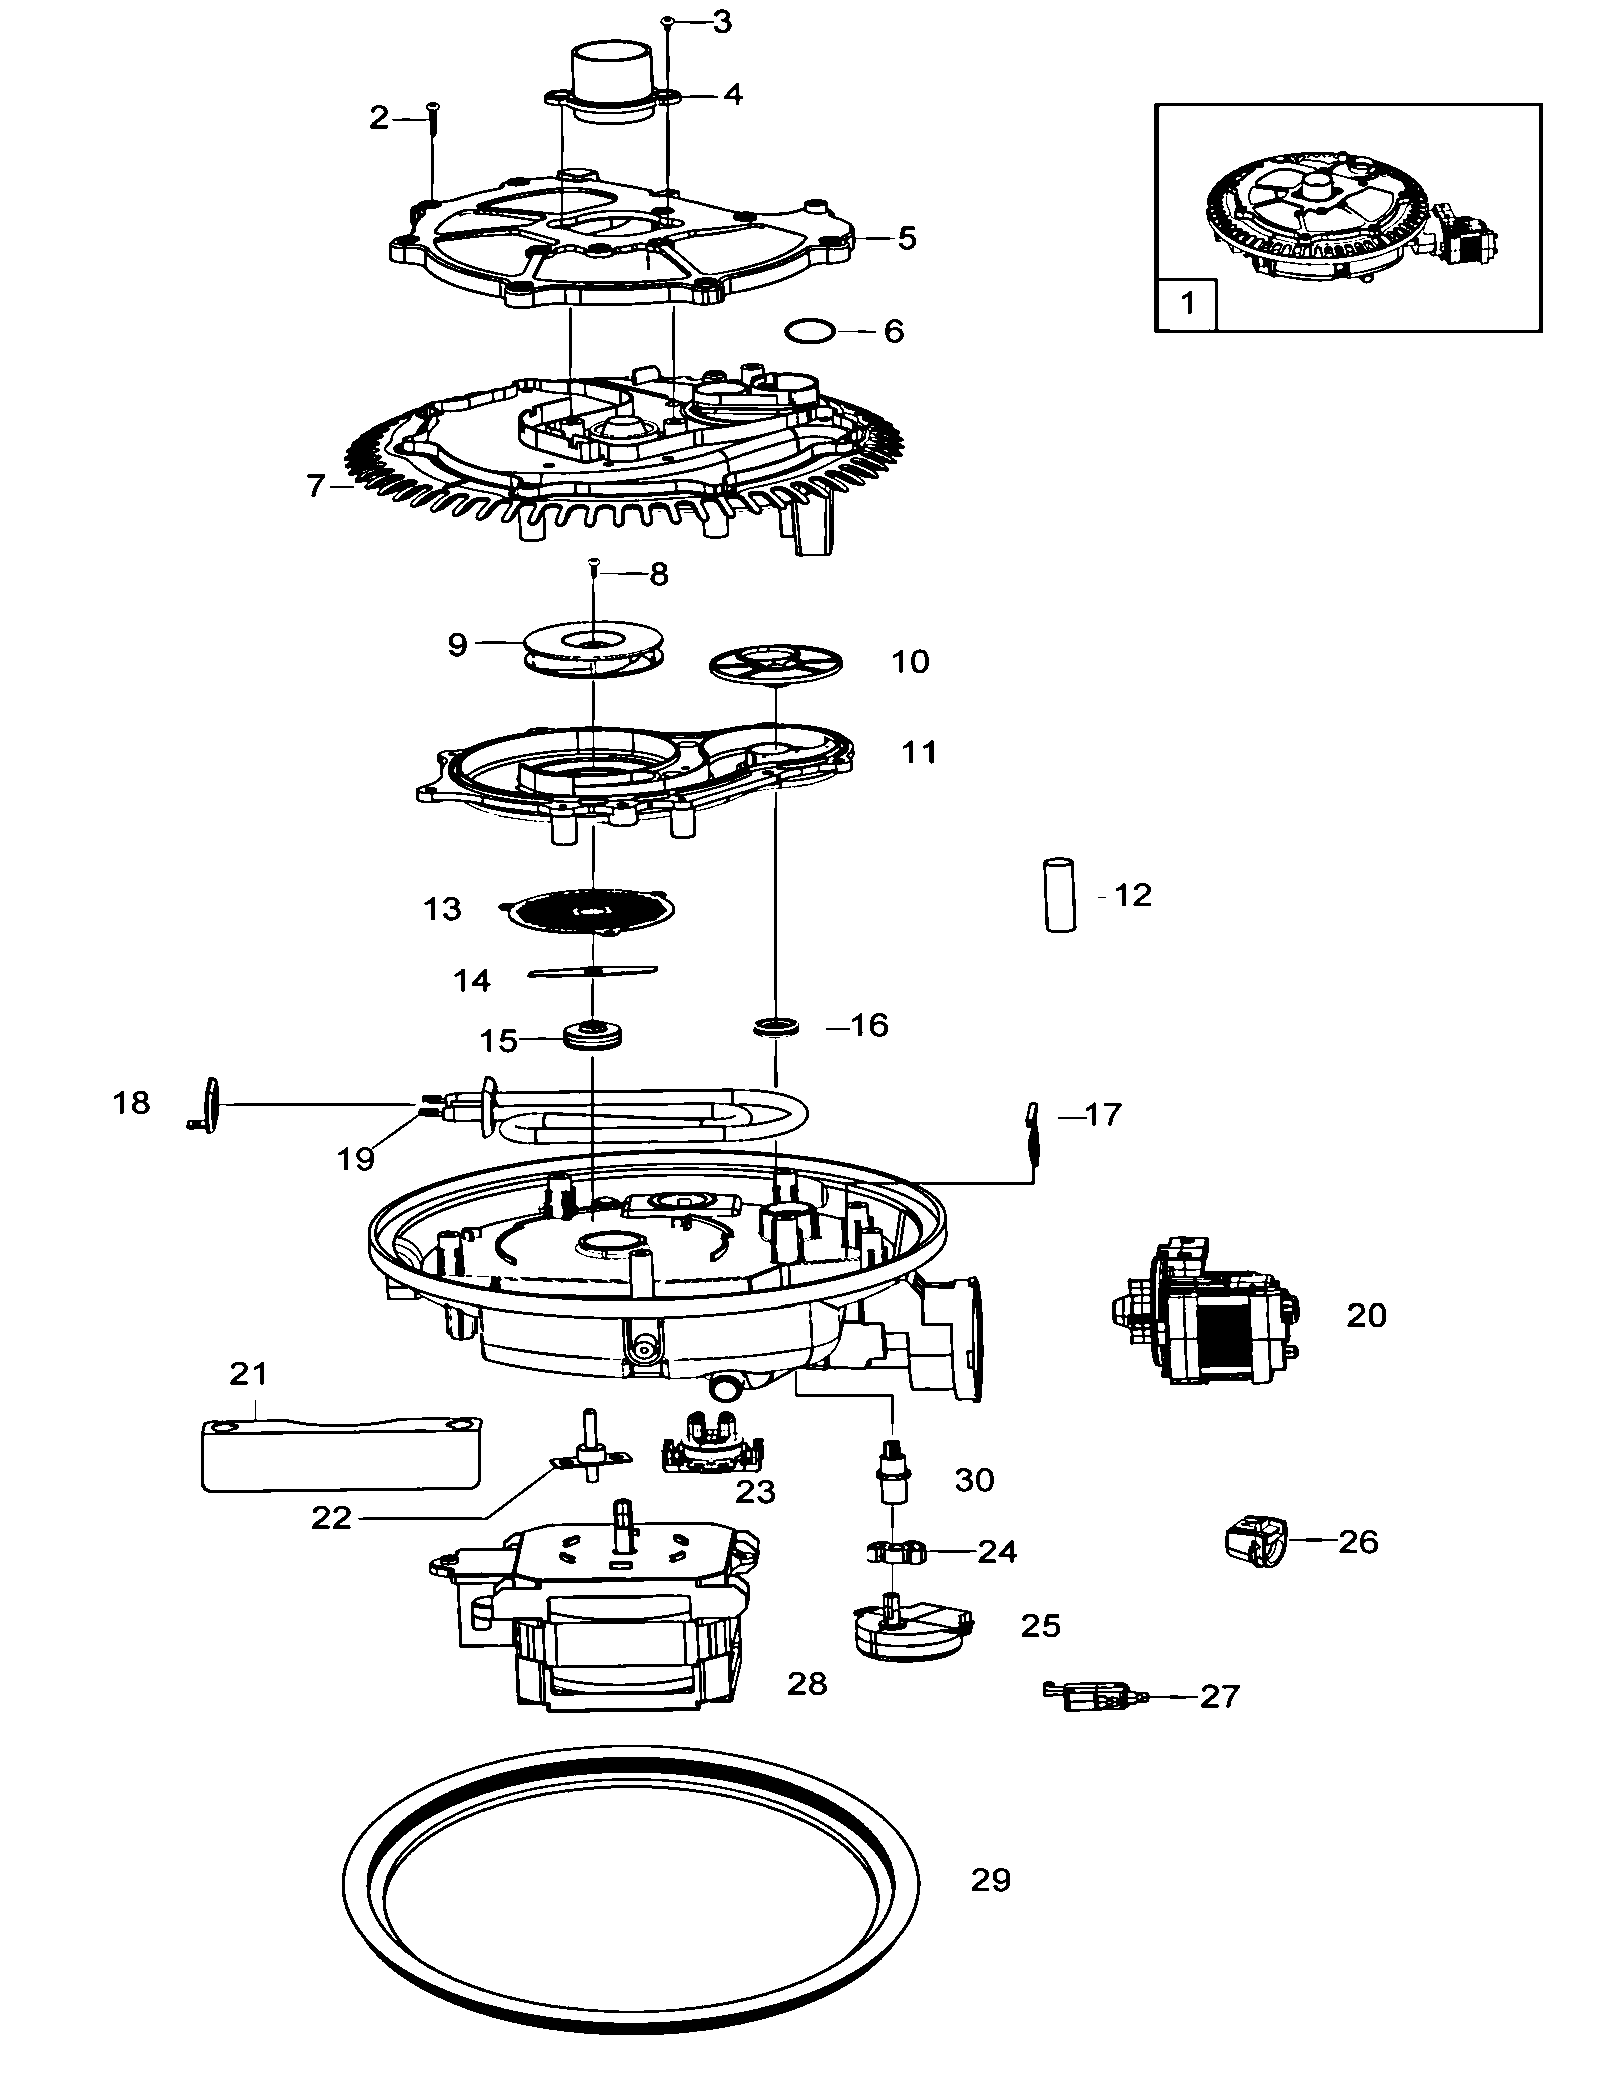 hight resolution of samsung dmt800rhs xaa pump assy diagram